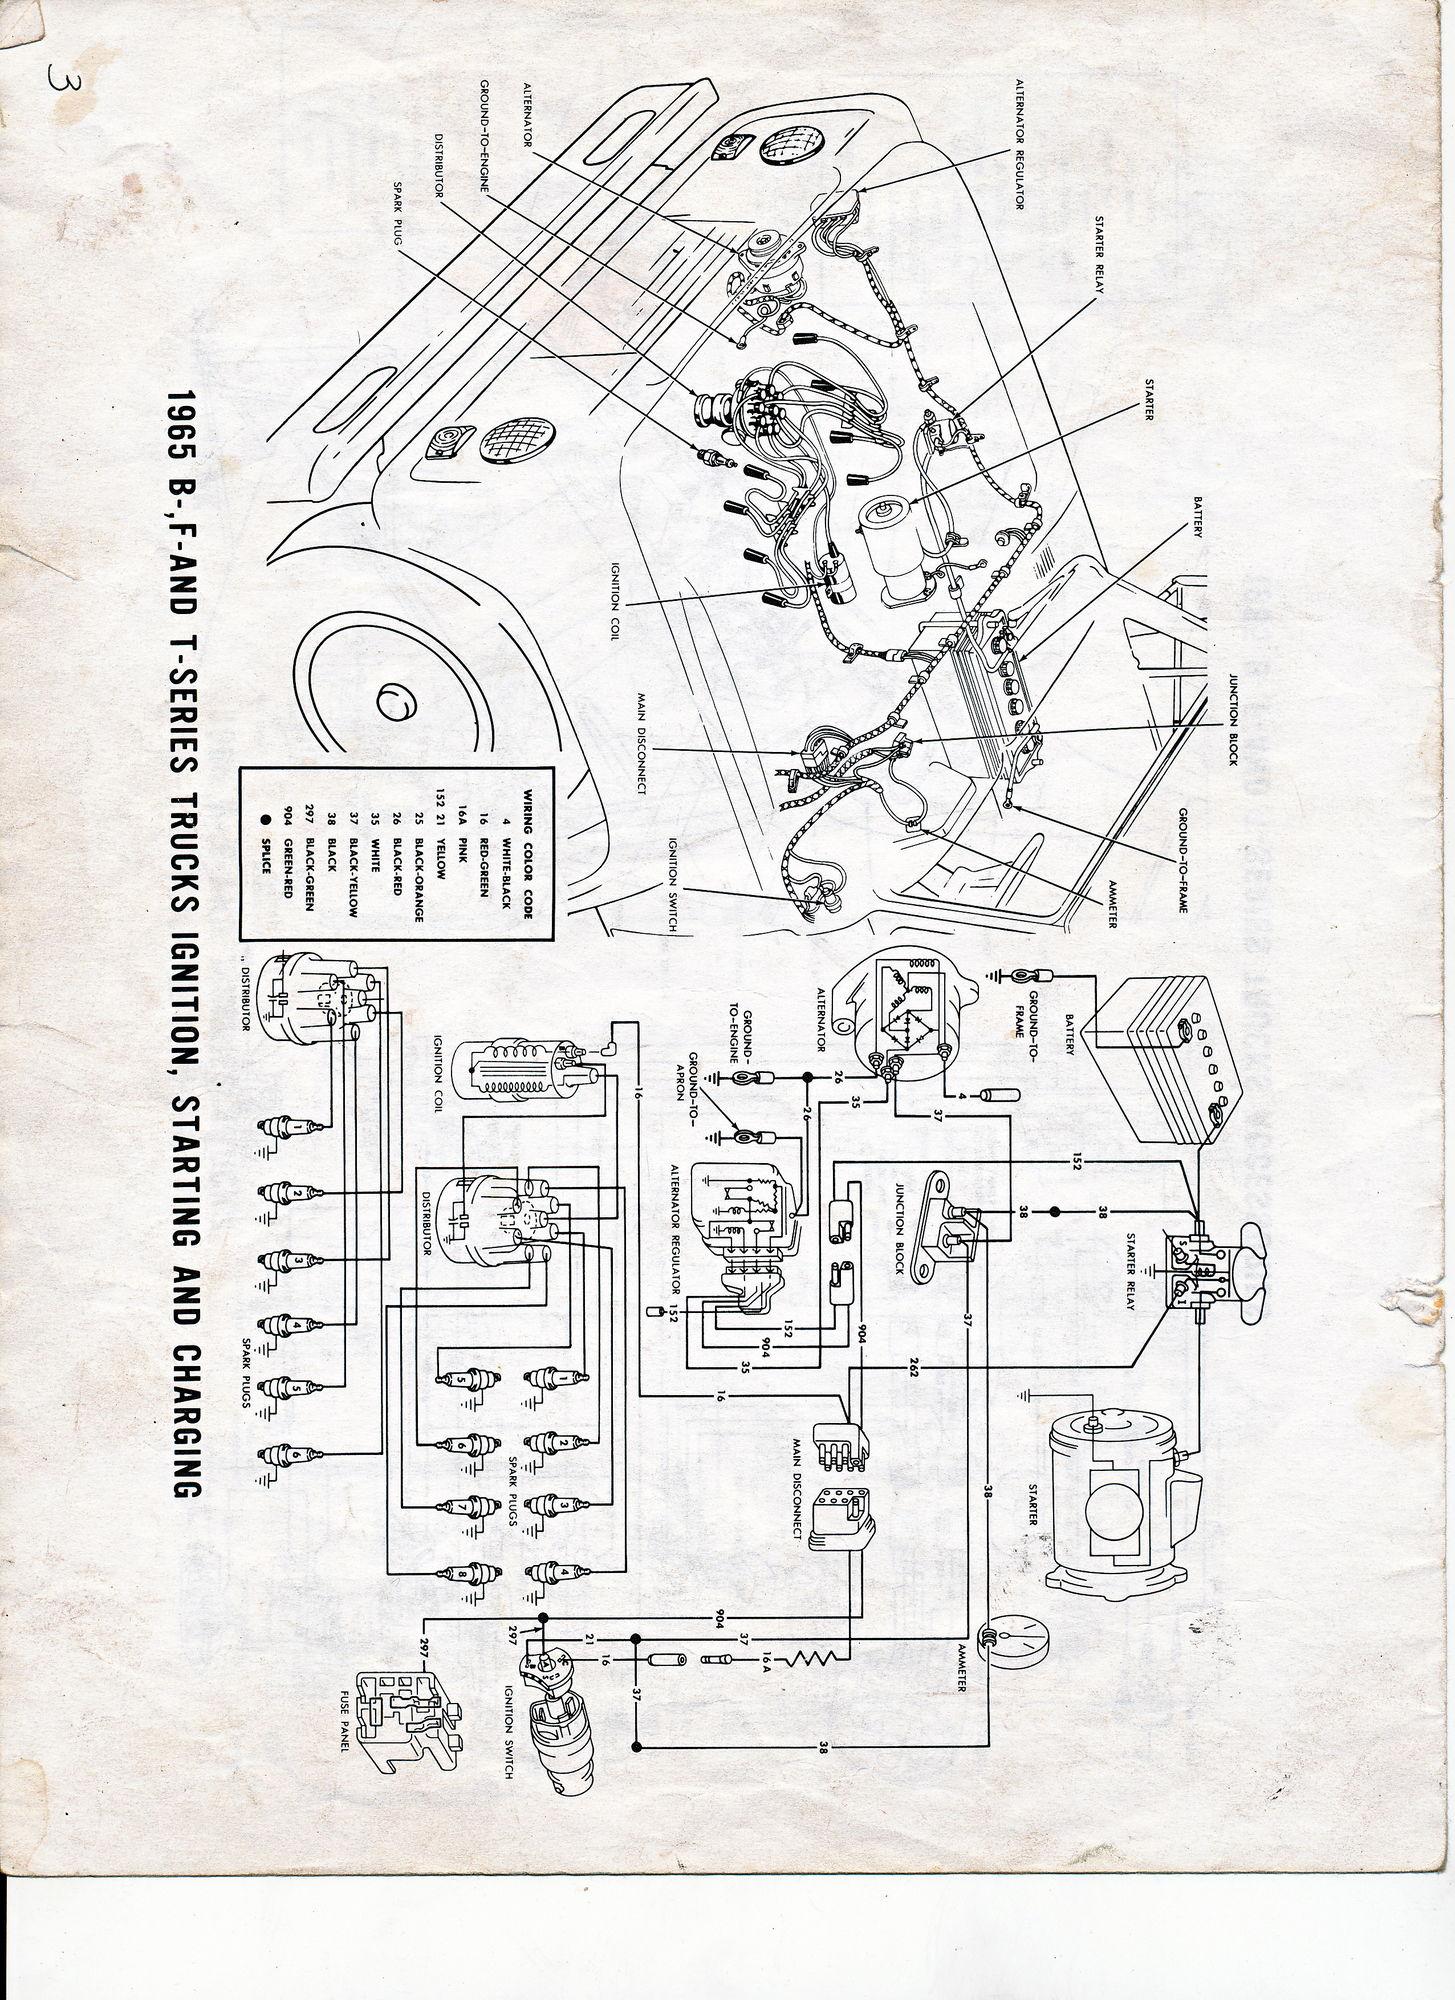 1973 mustang voltage regulator wiring diagram